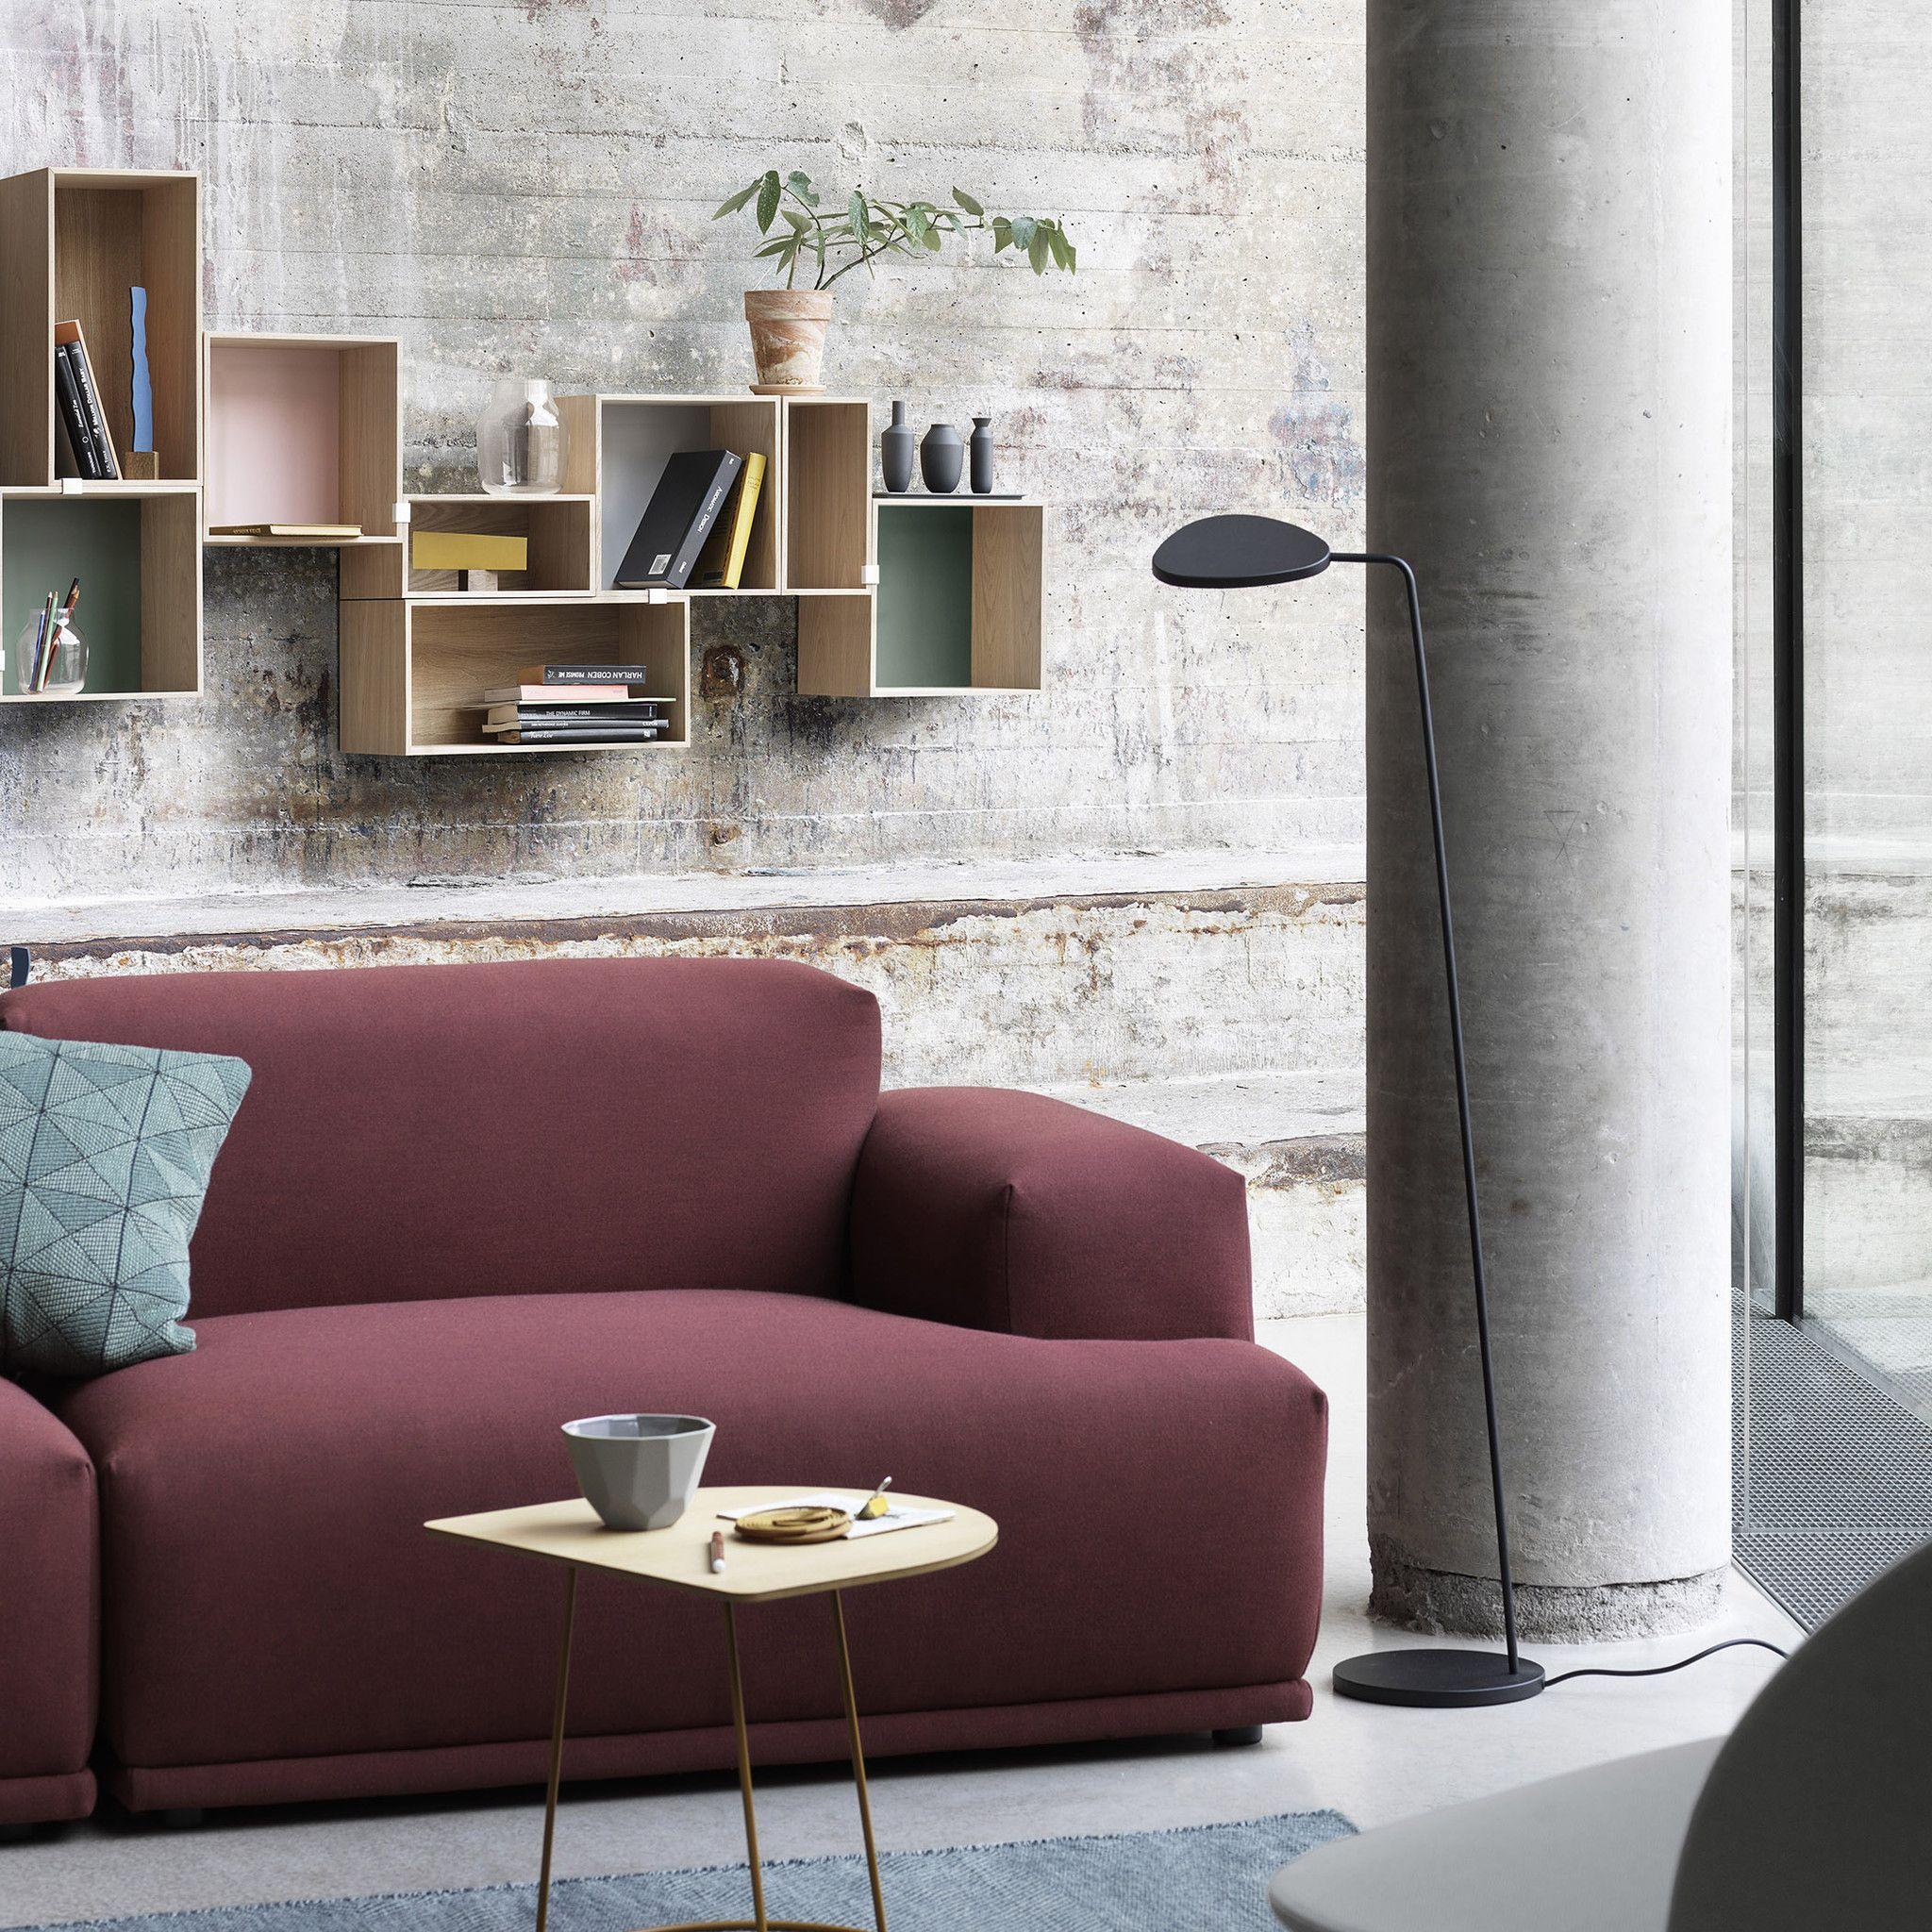 Leaf Floor Lamp In 2019 Home Interior Design Living